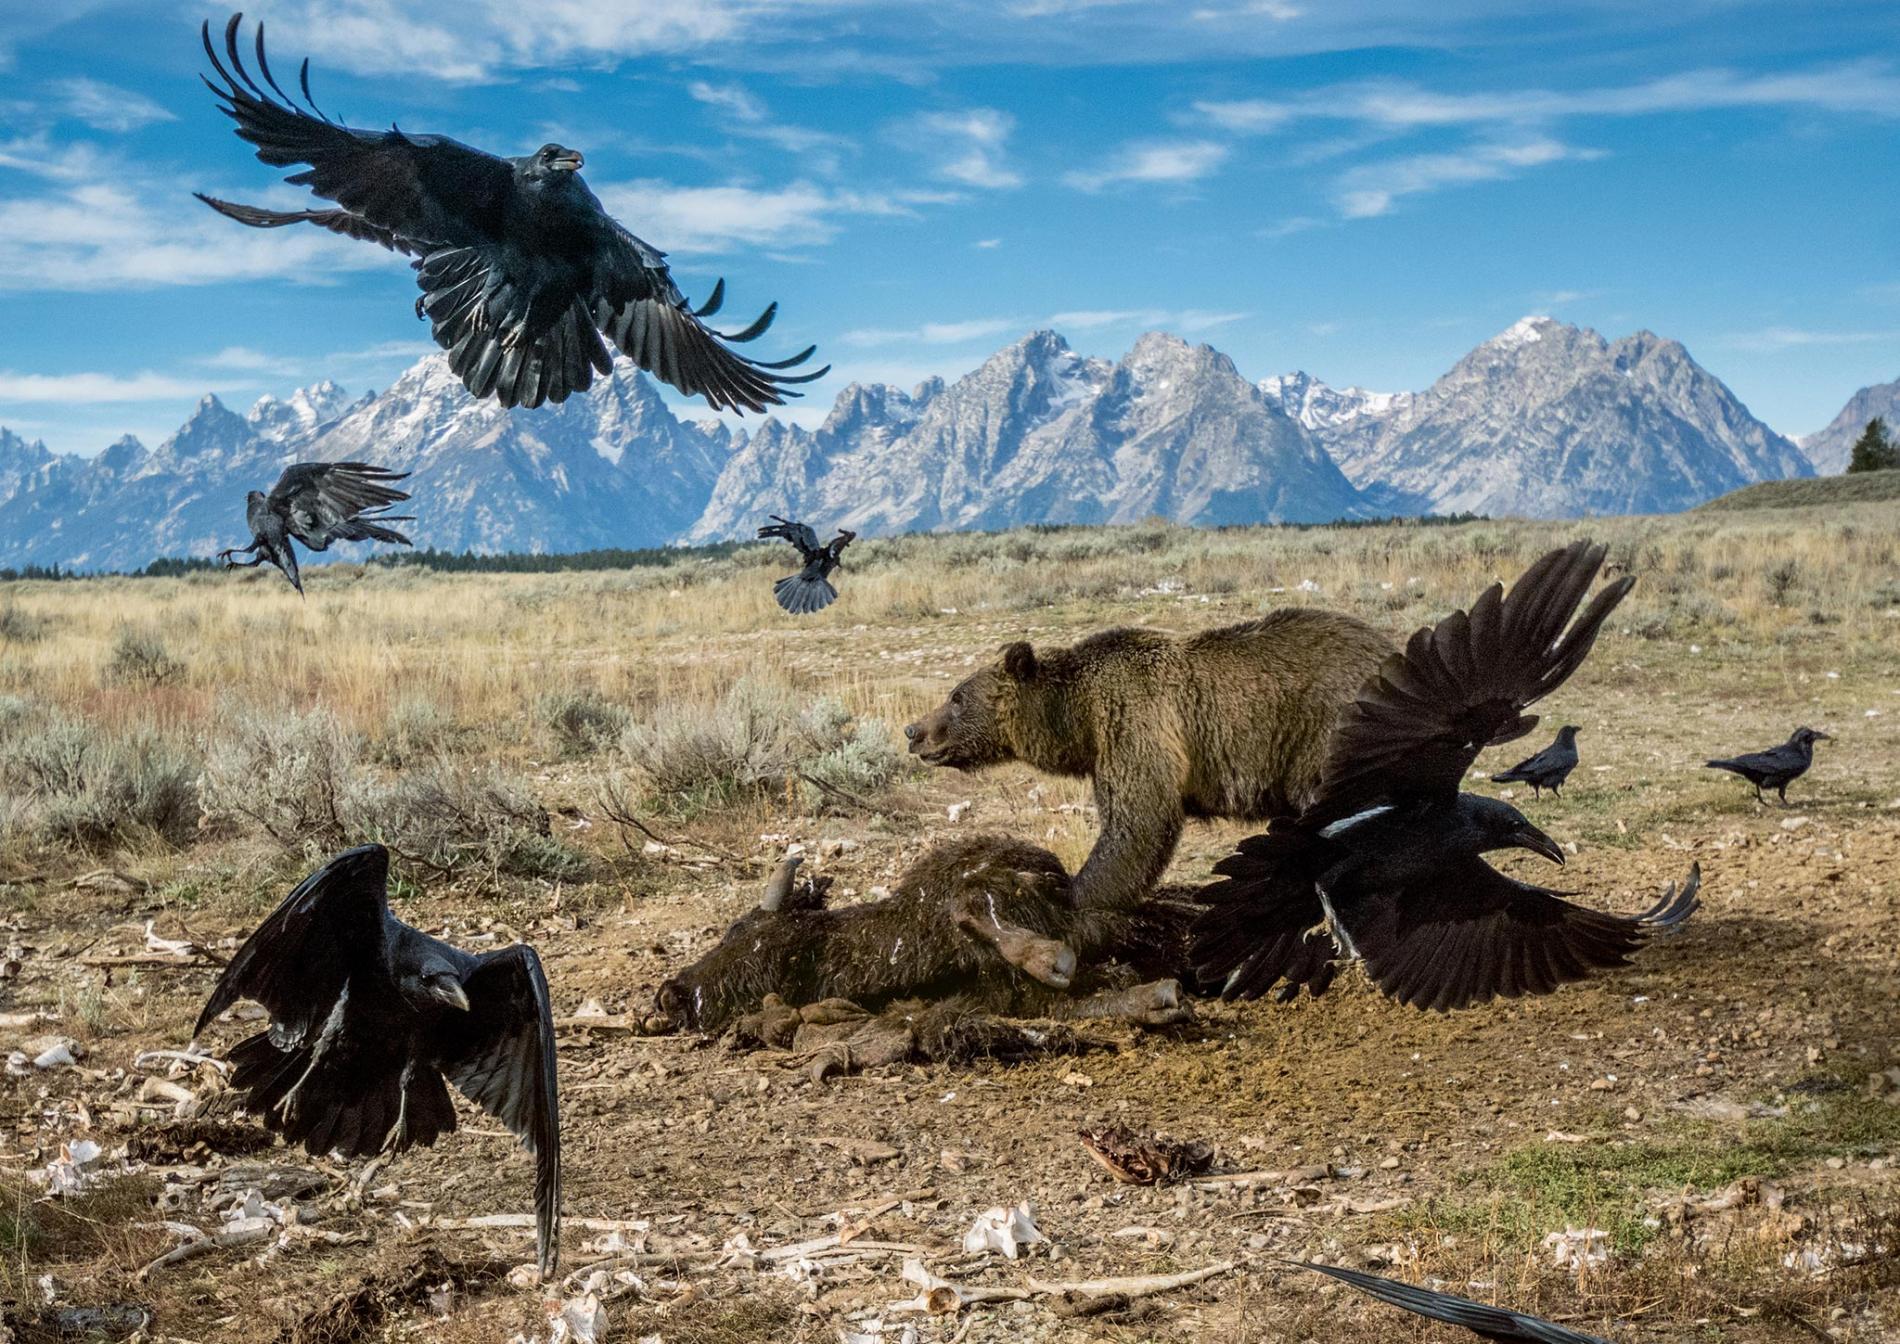 teton-grizzly-feeding.ngsversion.1482289627463.adapt.1900.1.jpg